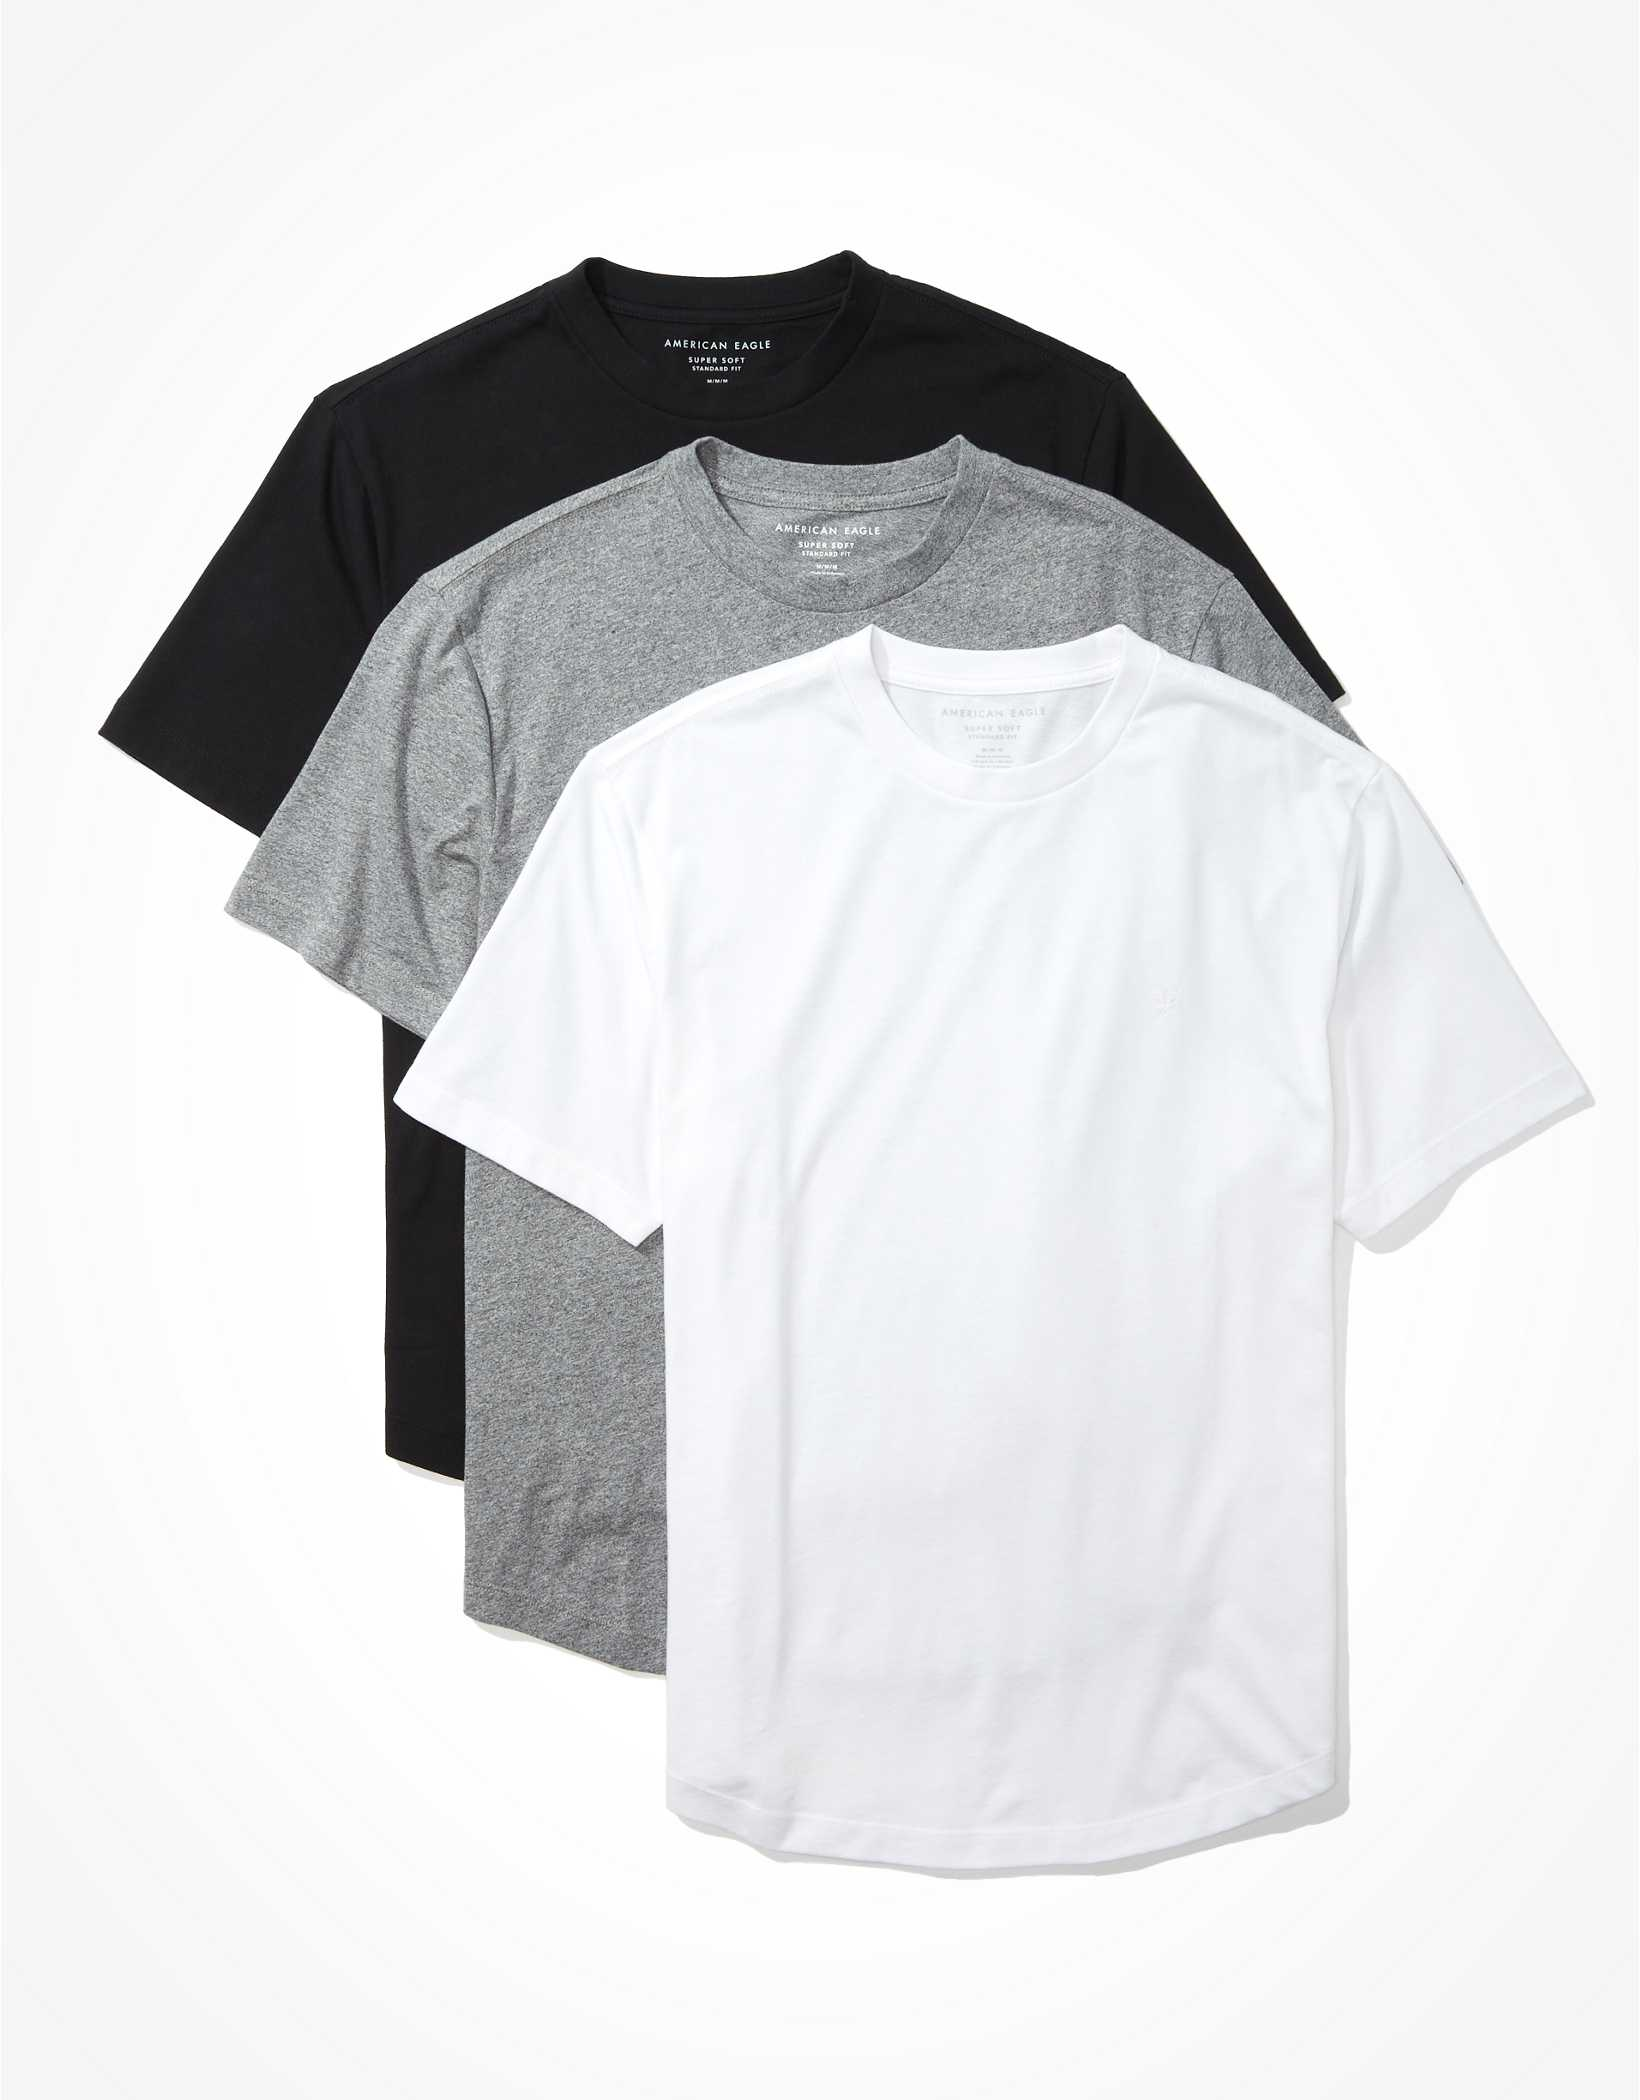 AE Super Soft Curved Hem T-Shirts 3-Pack